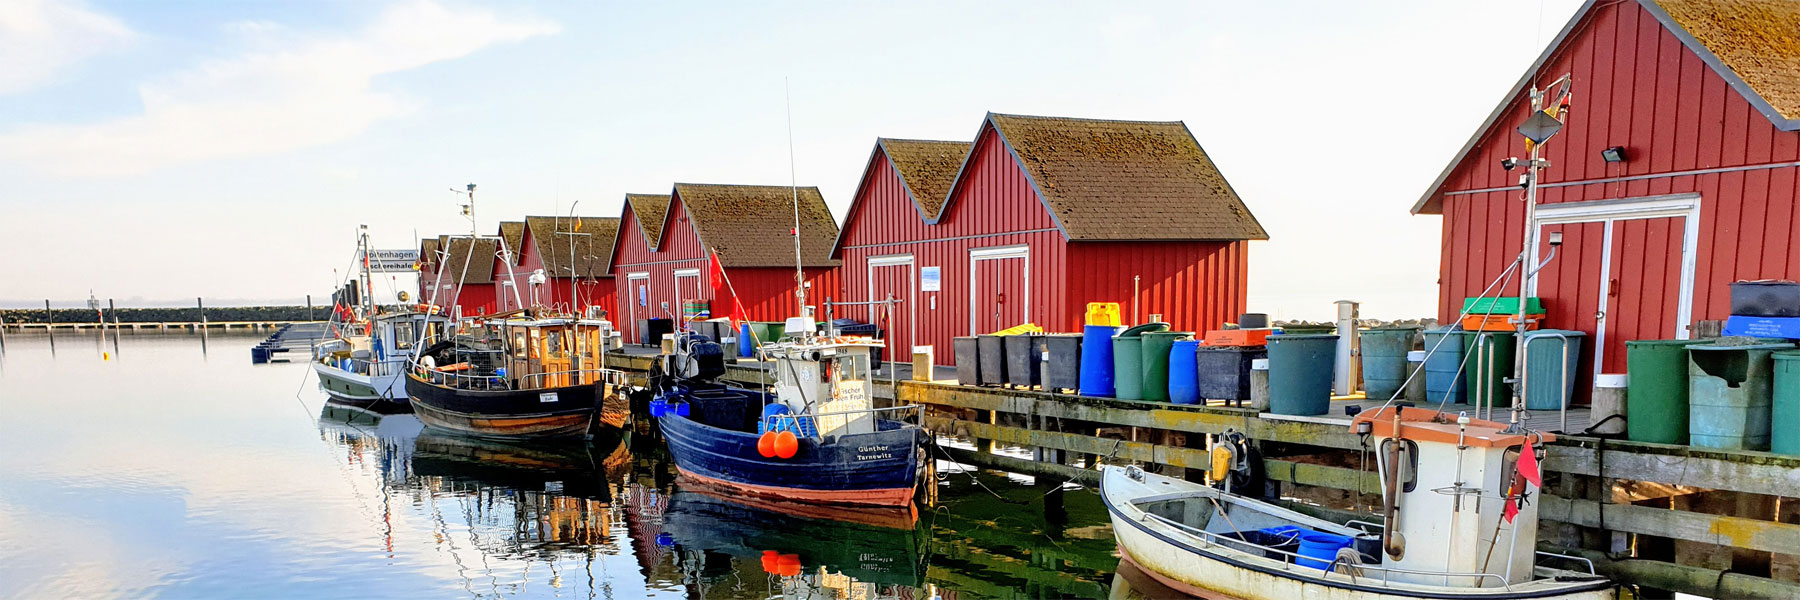 Hafen - Pension Cora